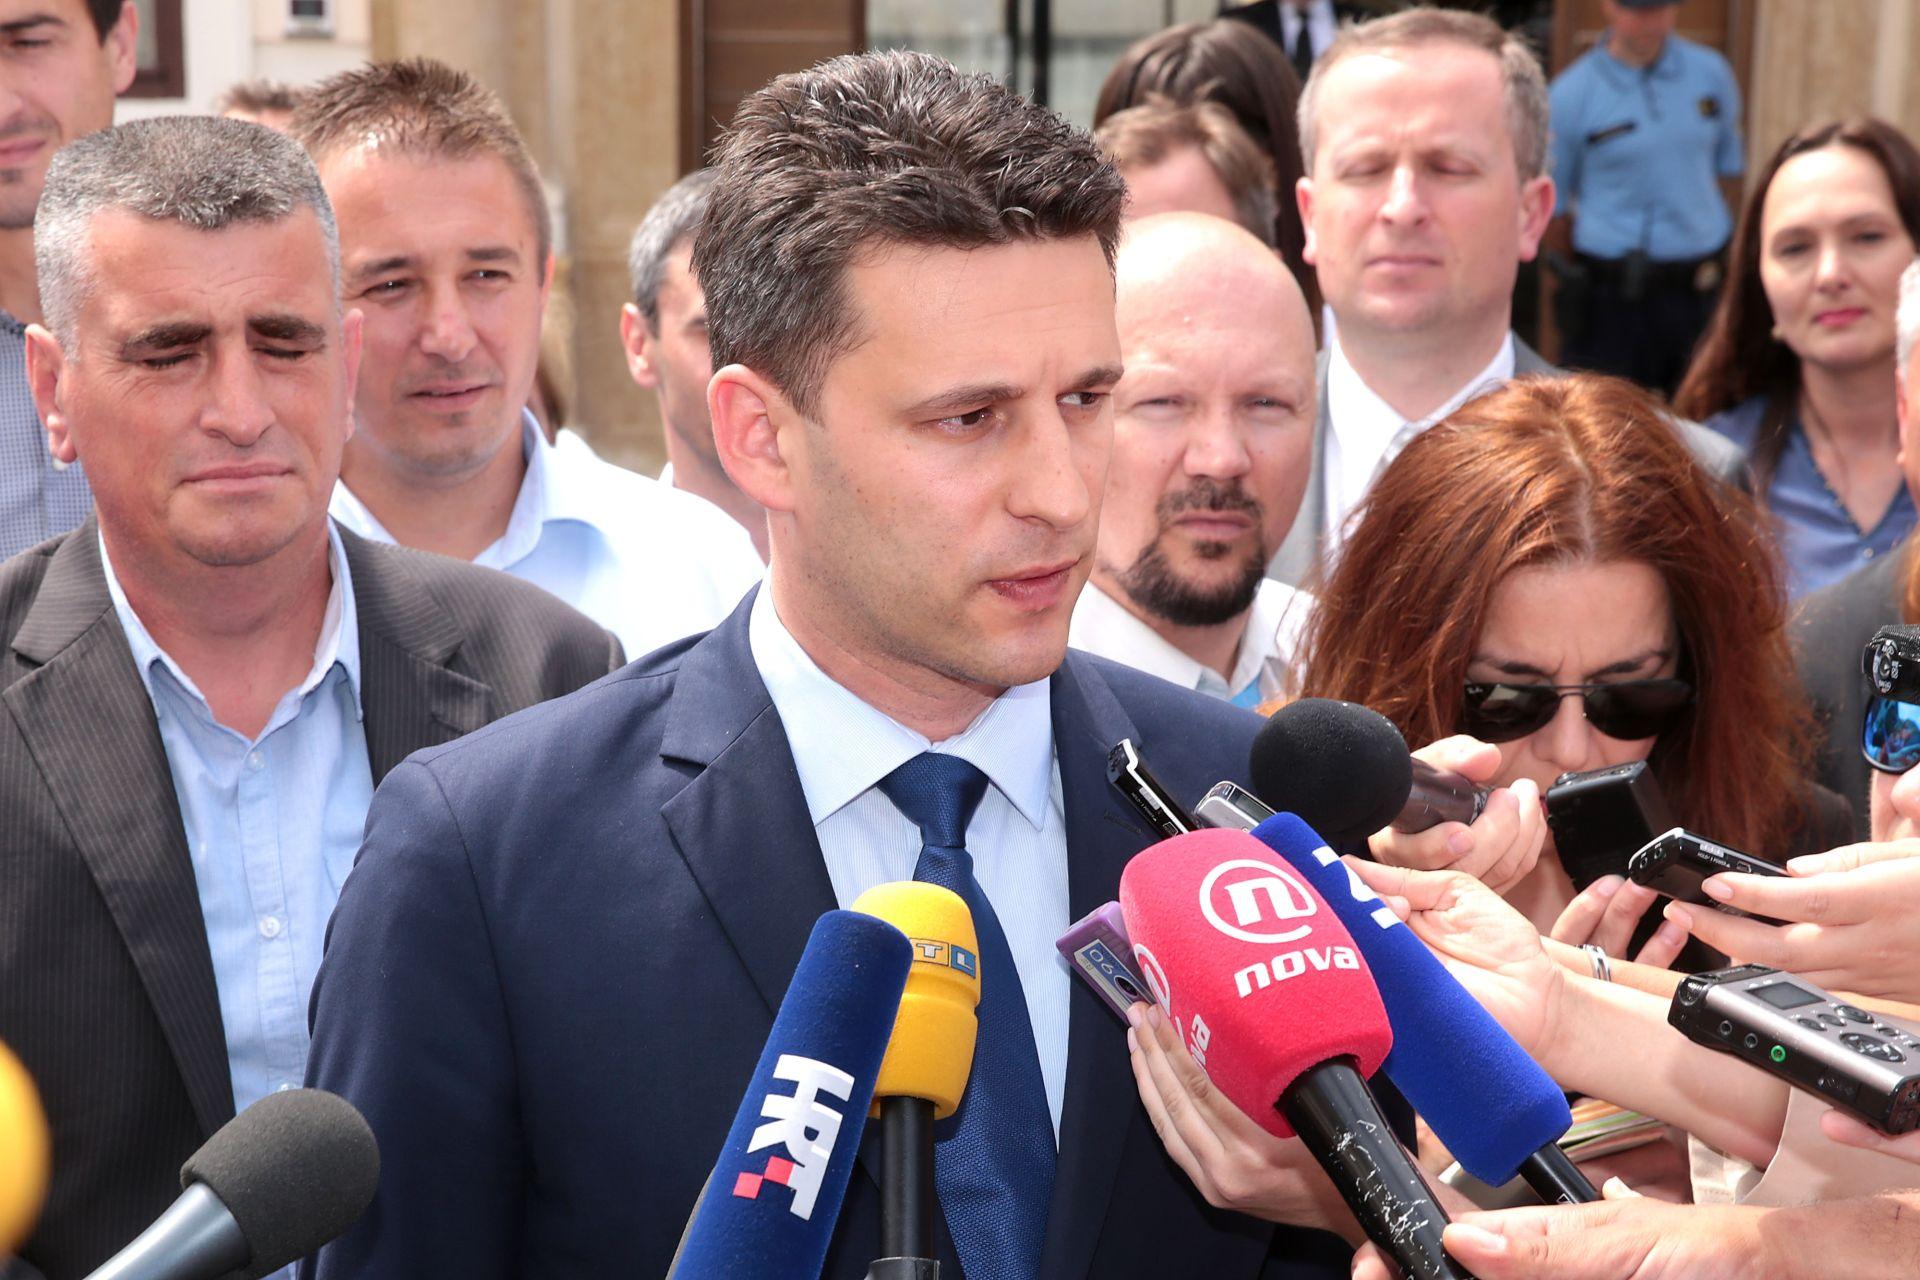 BOŽO PETROV 'Velika koalicija bila bi dan žalosti za Hrvatsku'